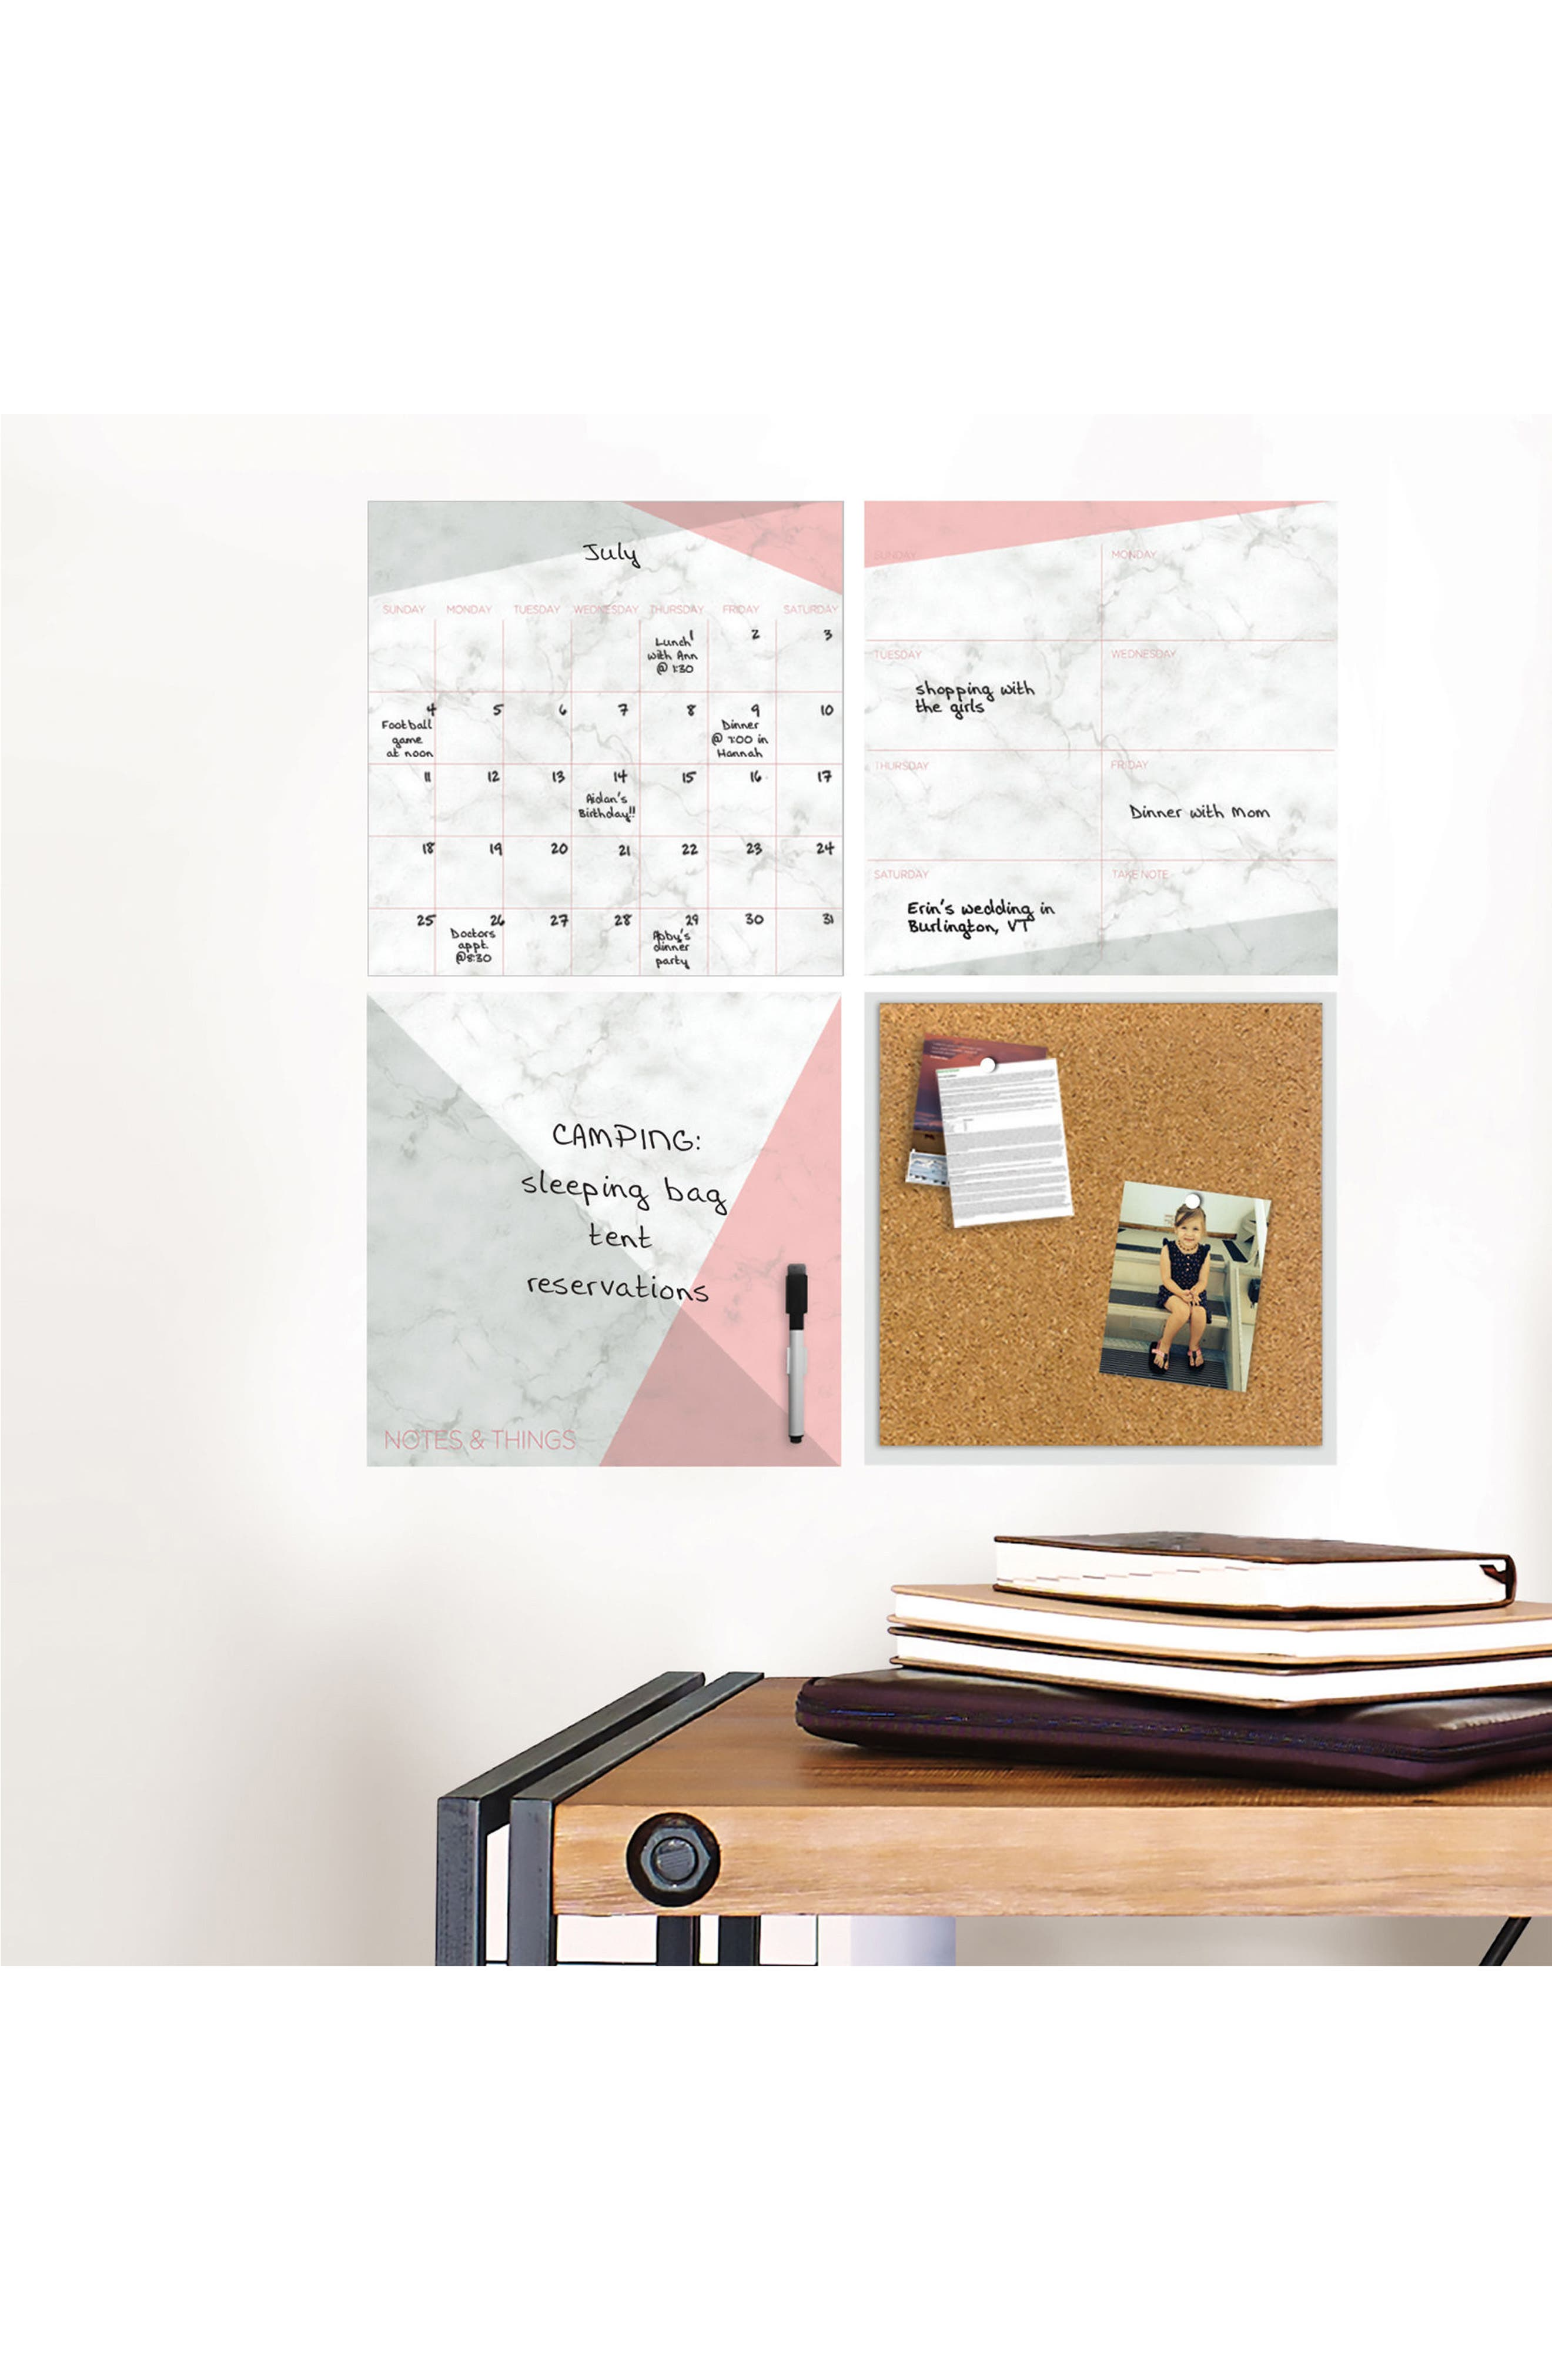 Everest Wall Decal Organization Kit,                             Alternate thumbnail 2, color,                             100